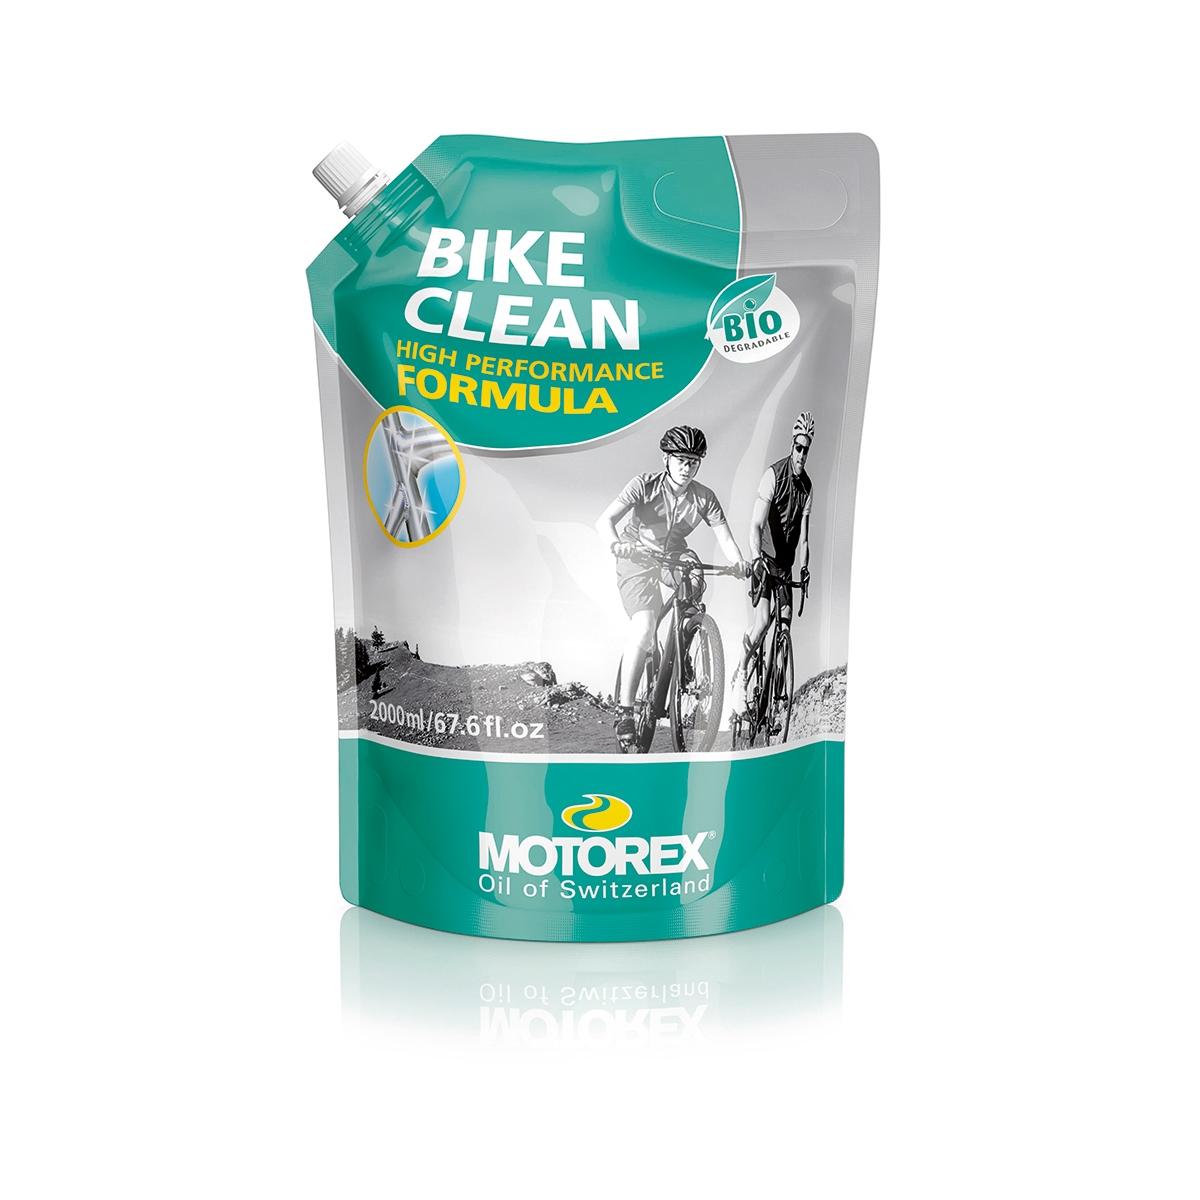 Degreaser Bike Clean Biodegradable 2L Refill Bag